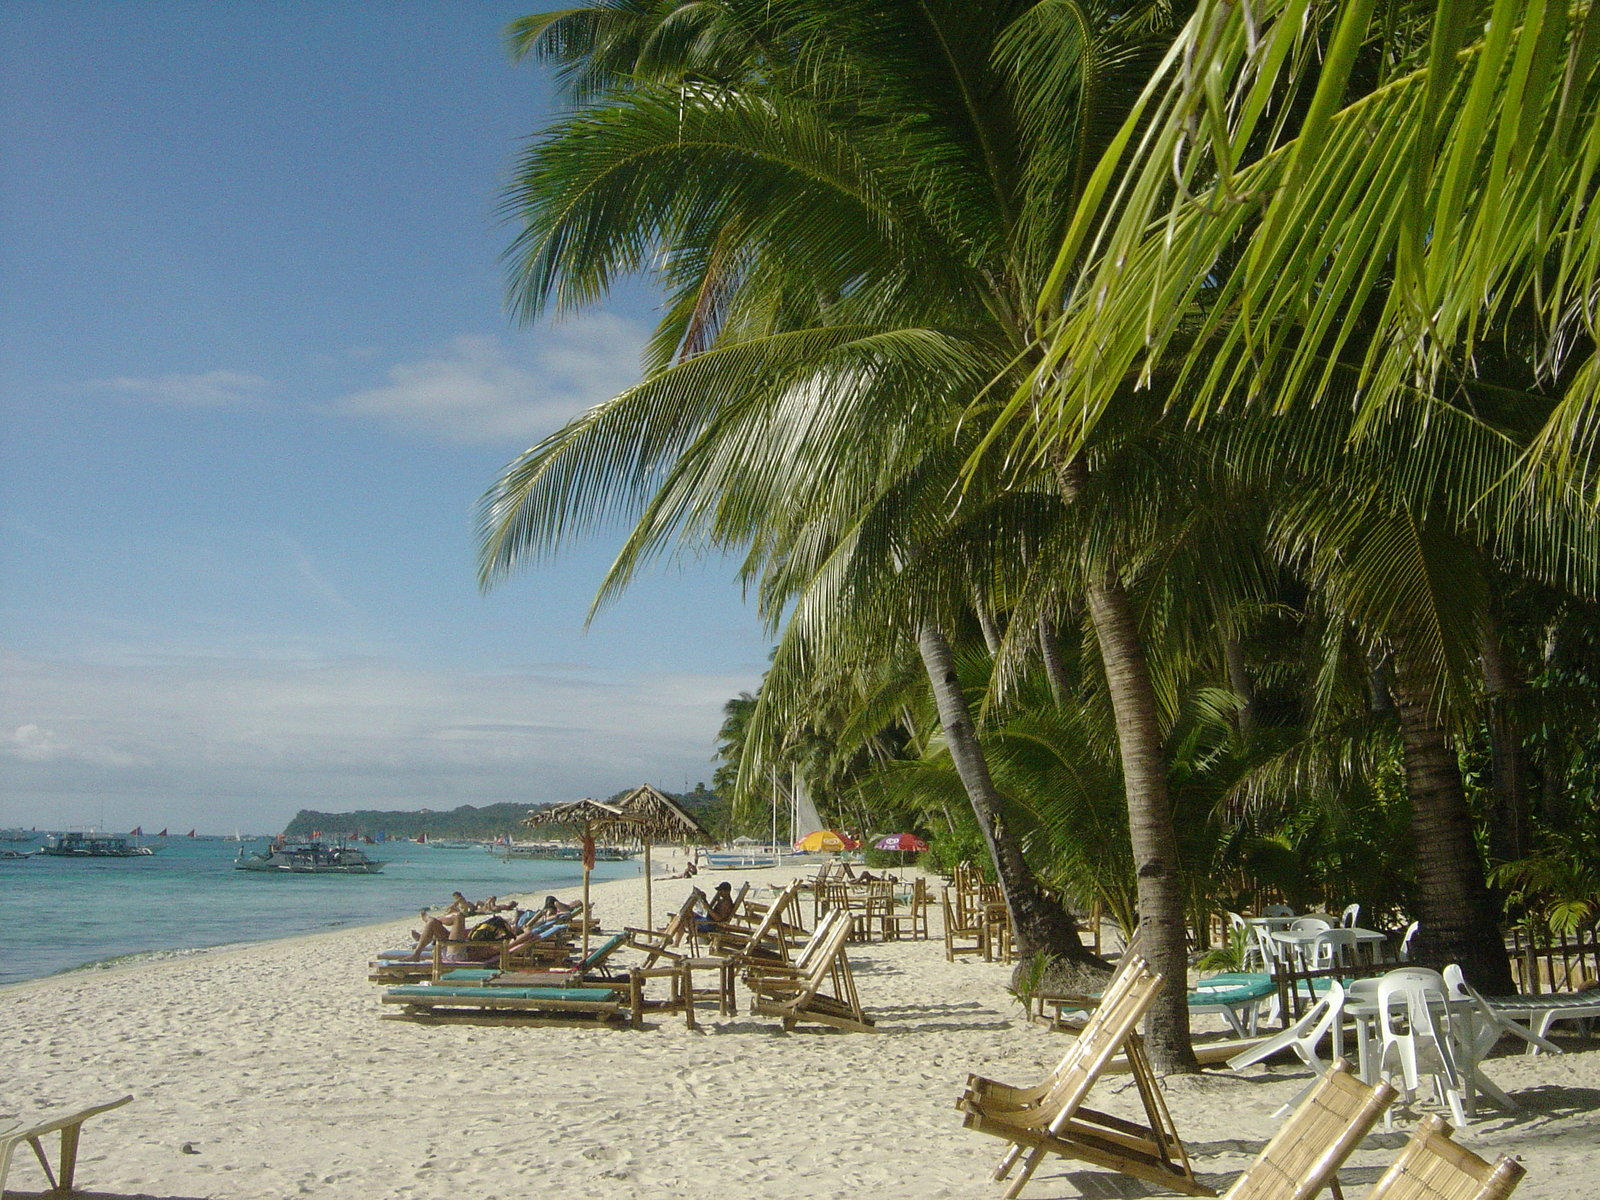 Плажът Tropical+beach+wallpaper-2